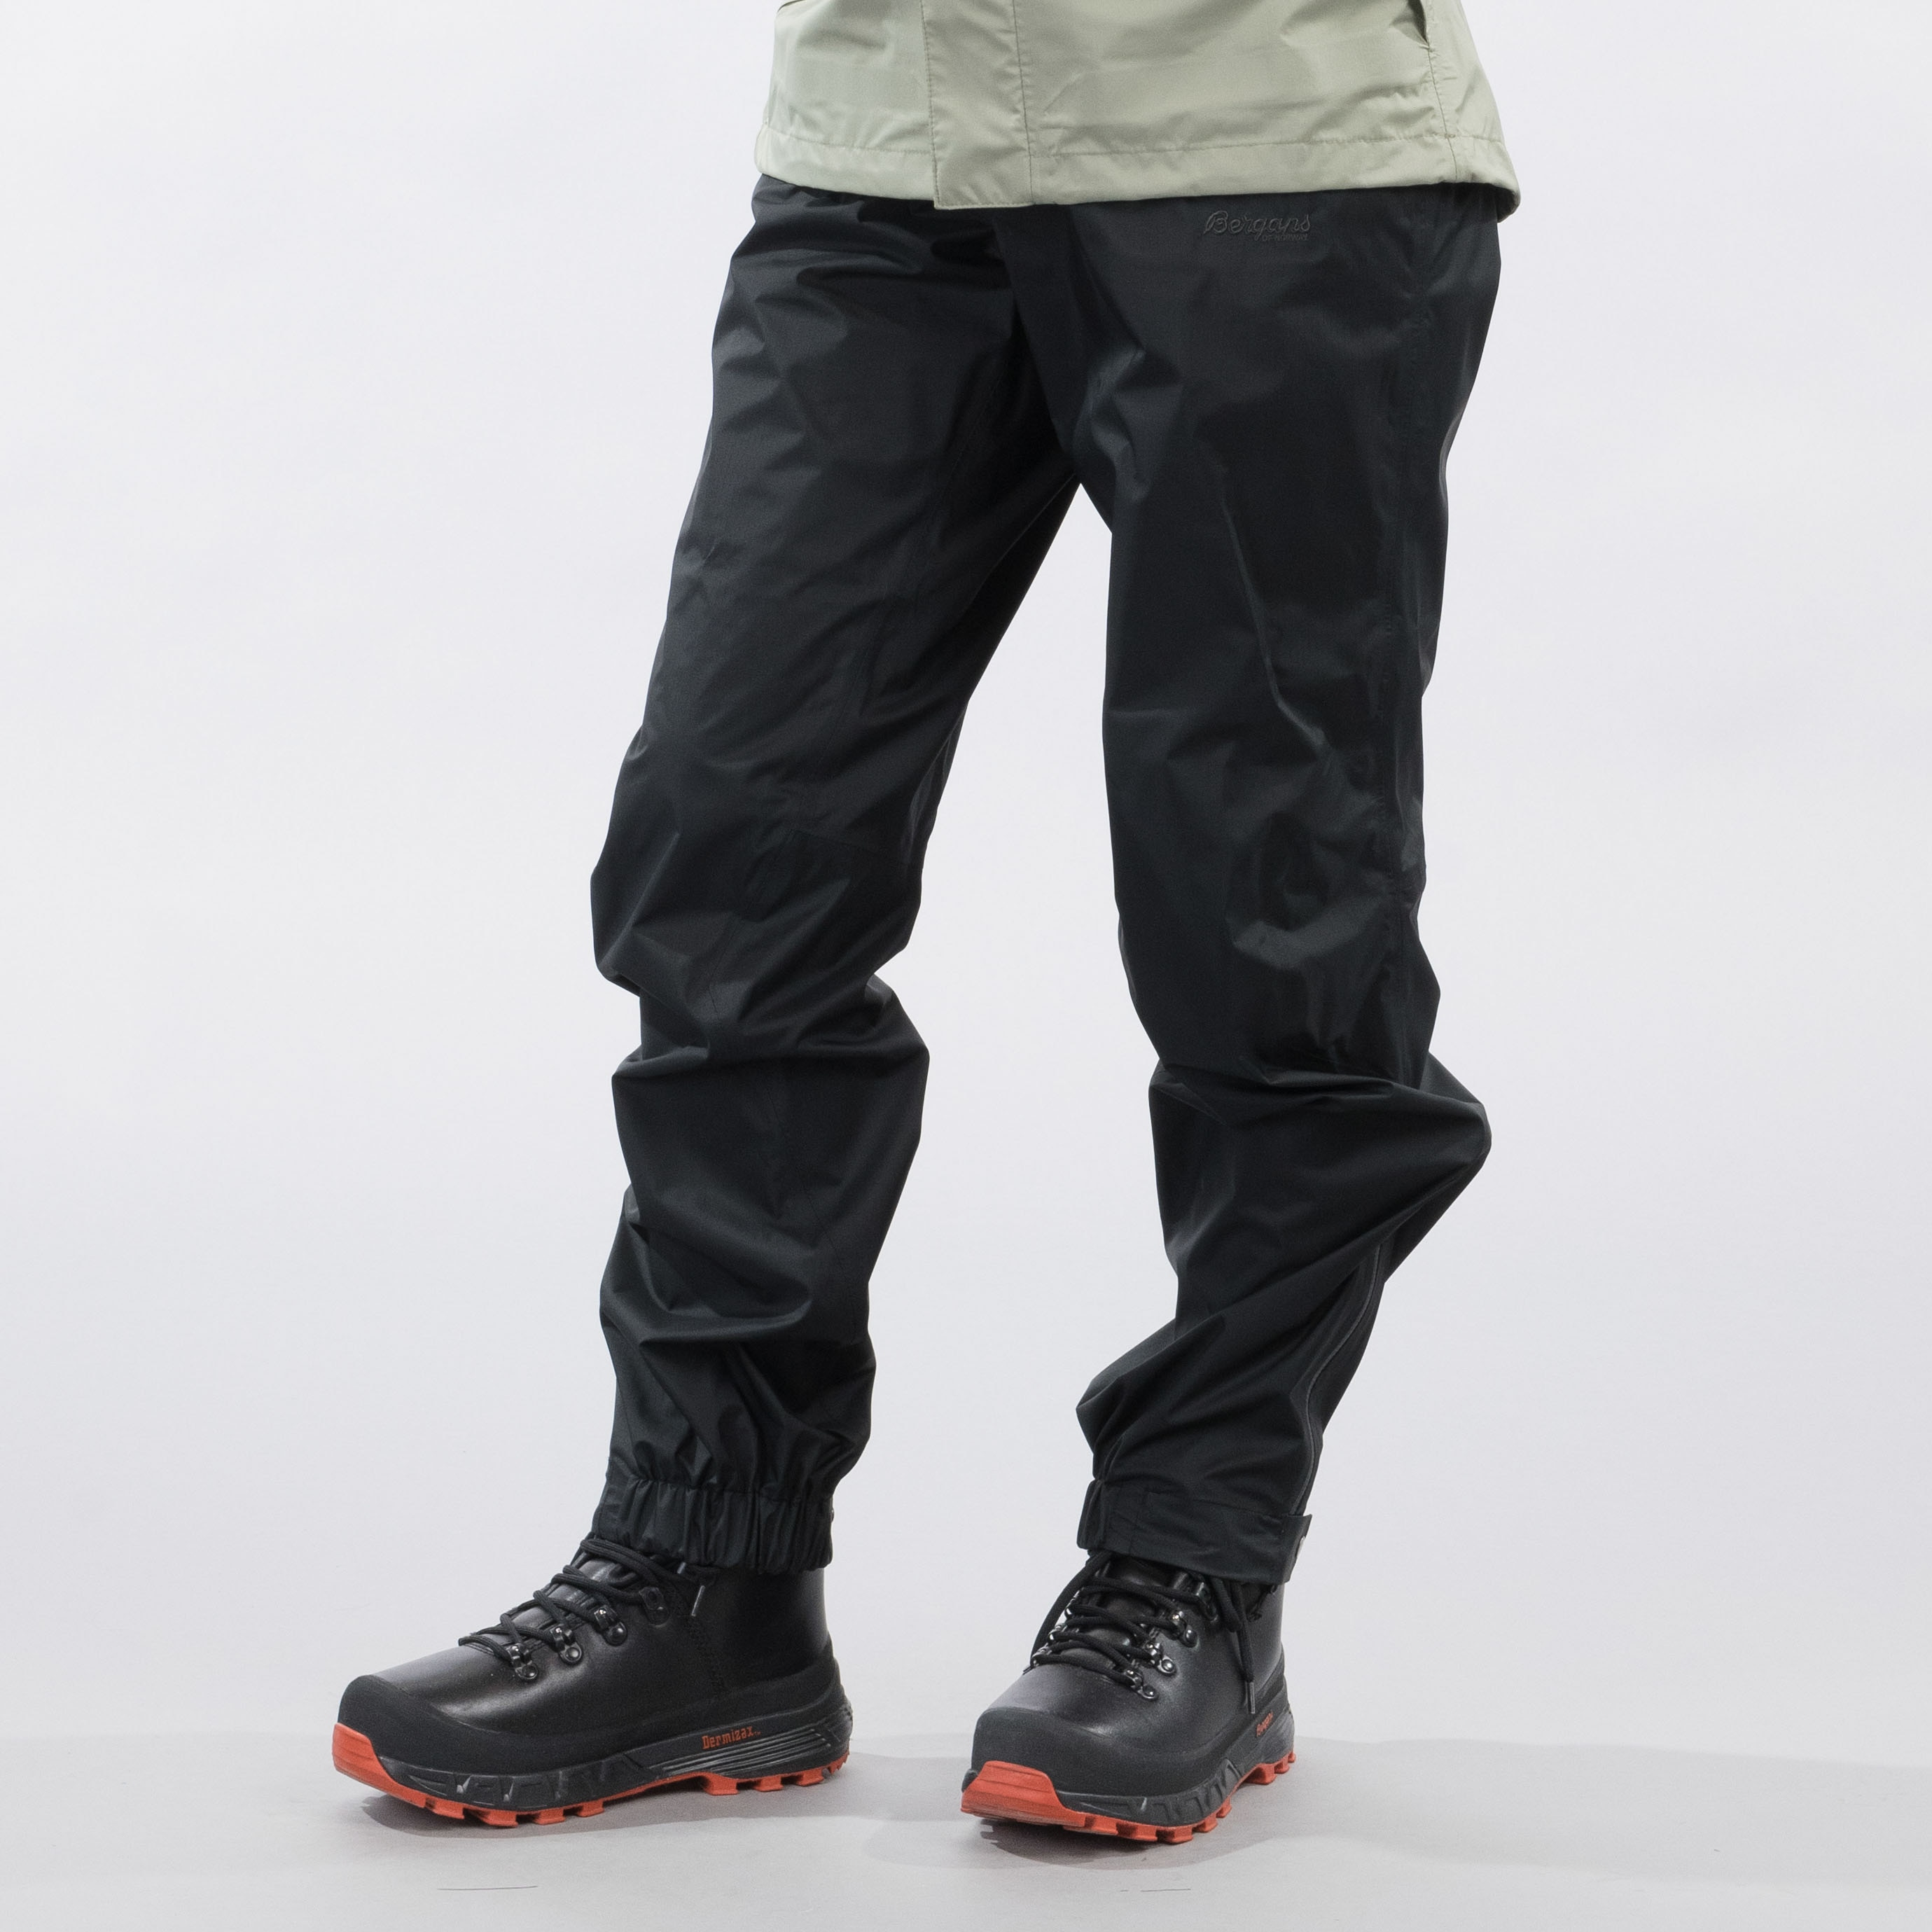 Vatne 3L W Pants